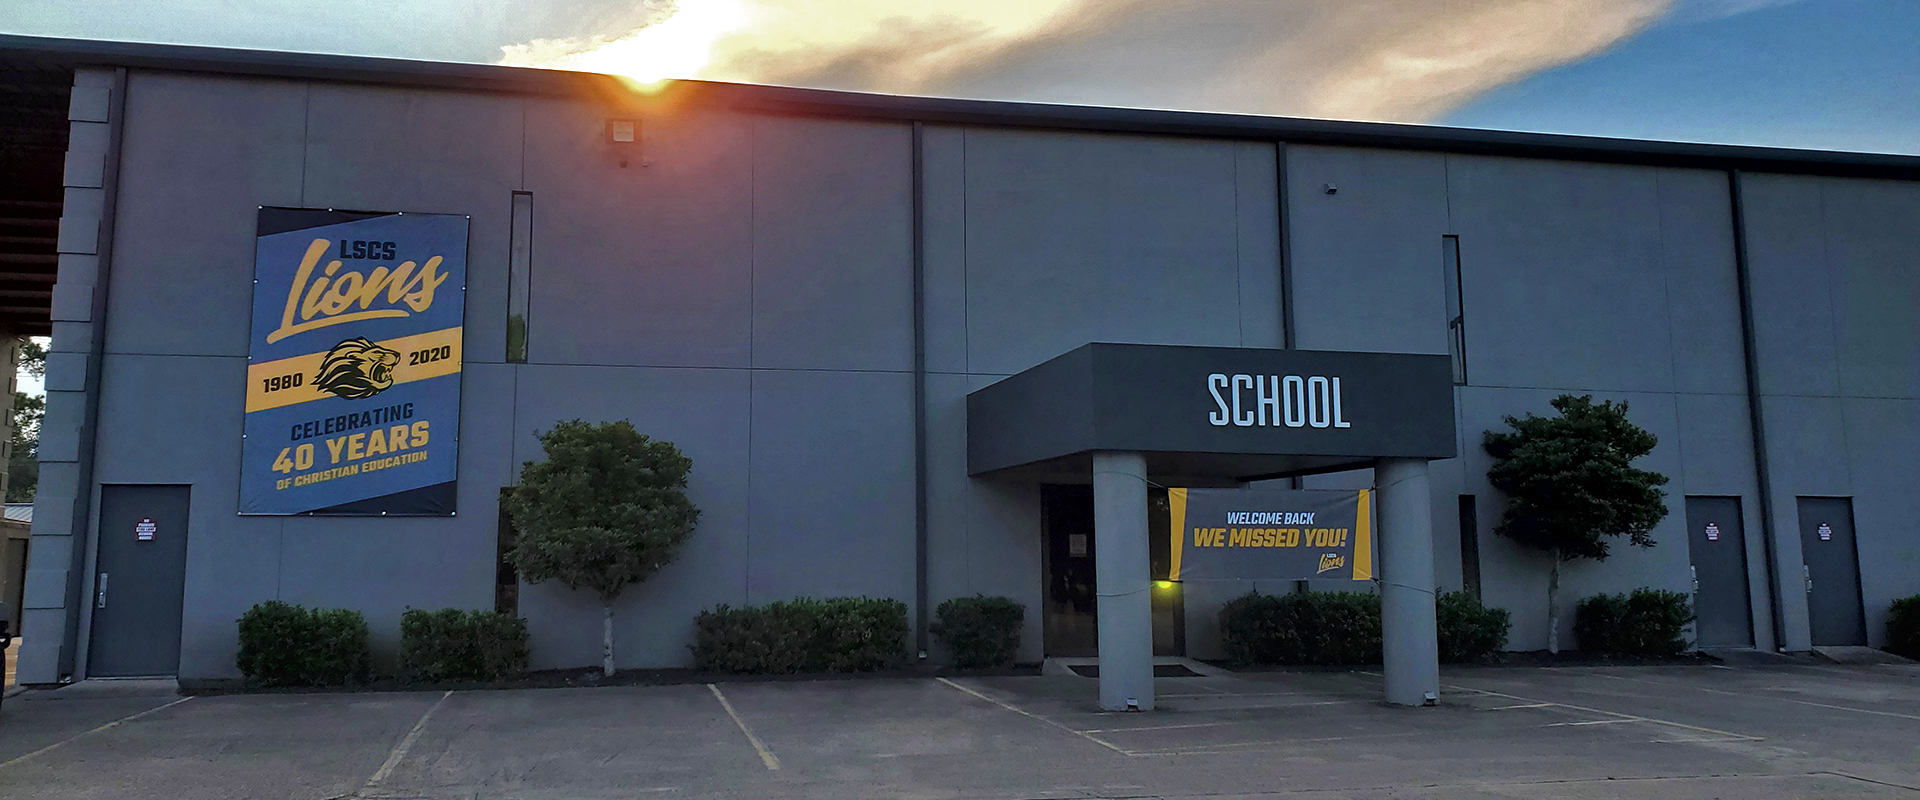 lscs_school_entrance